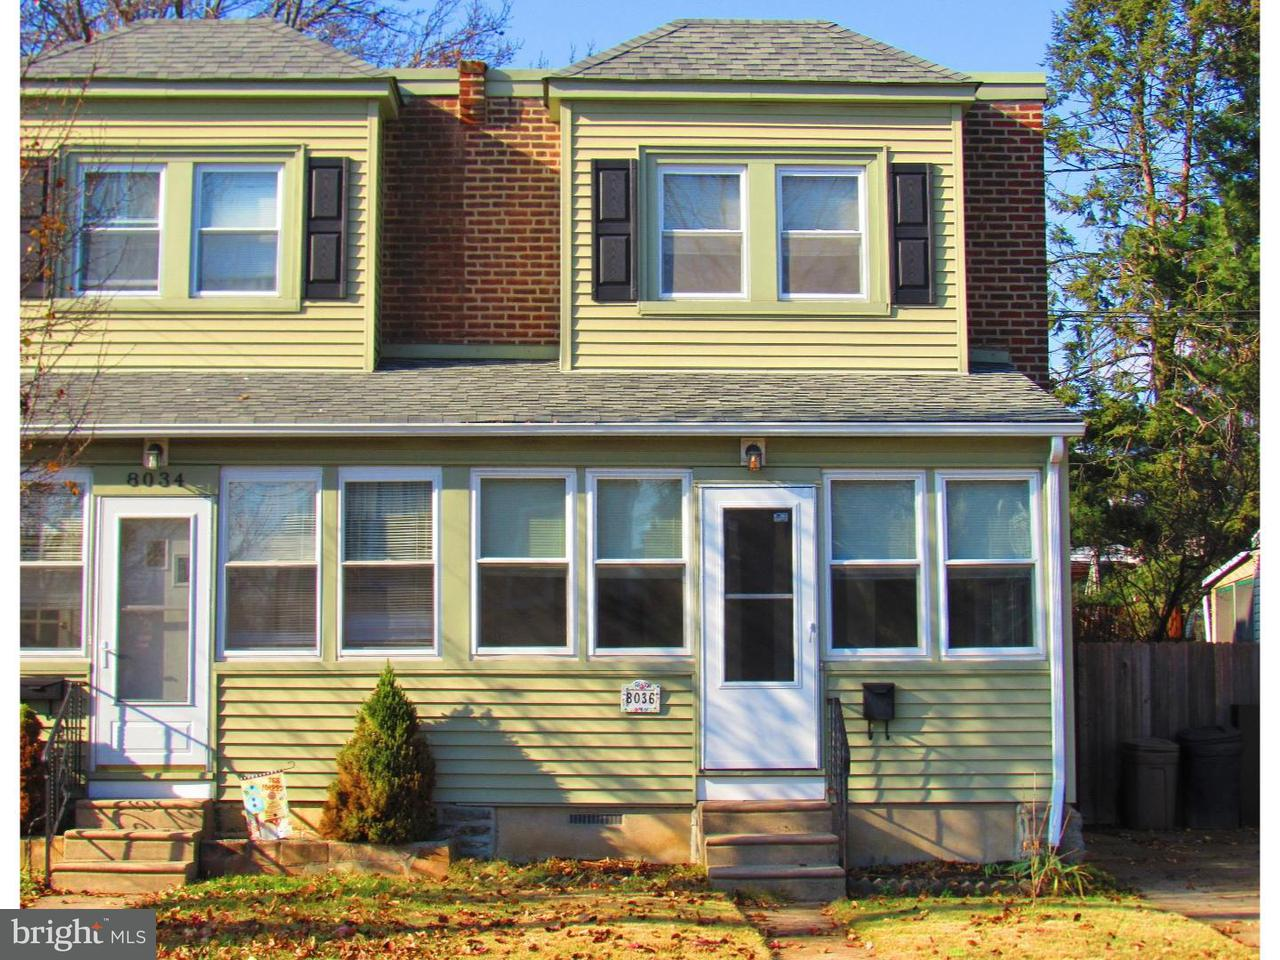 8036  Ferndale Philadelphia , PA 19111